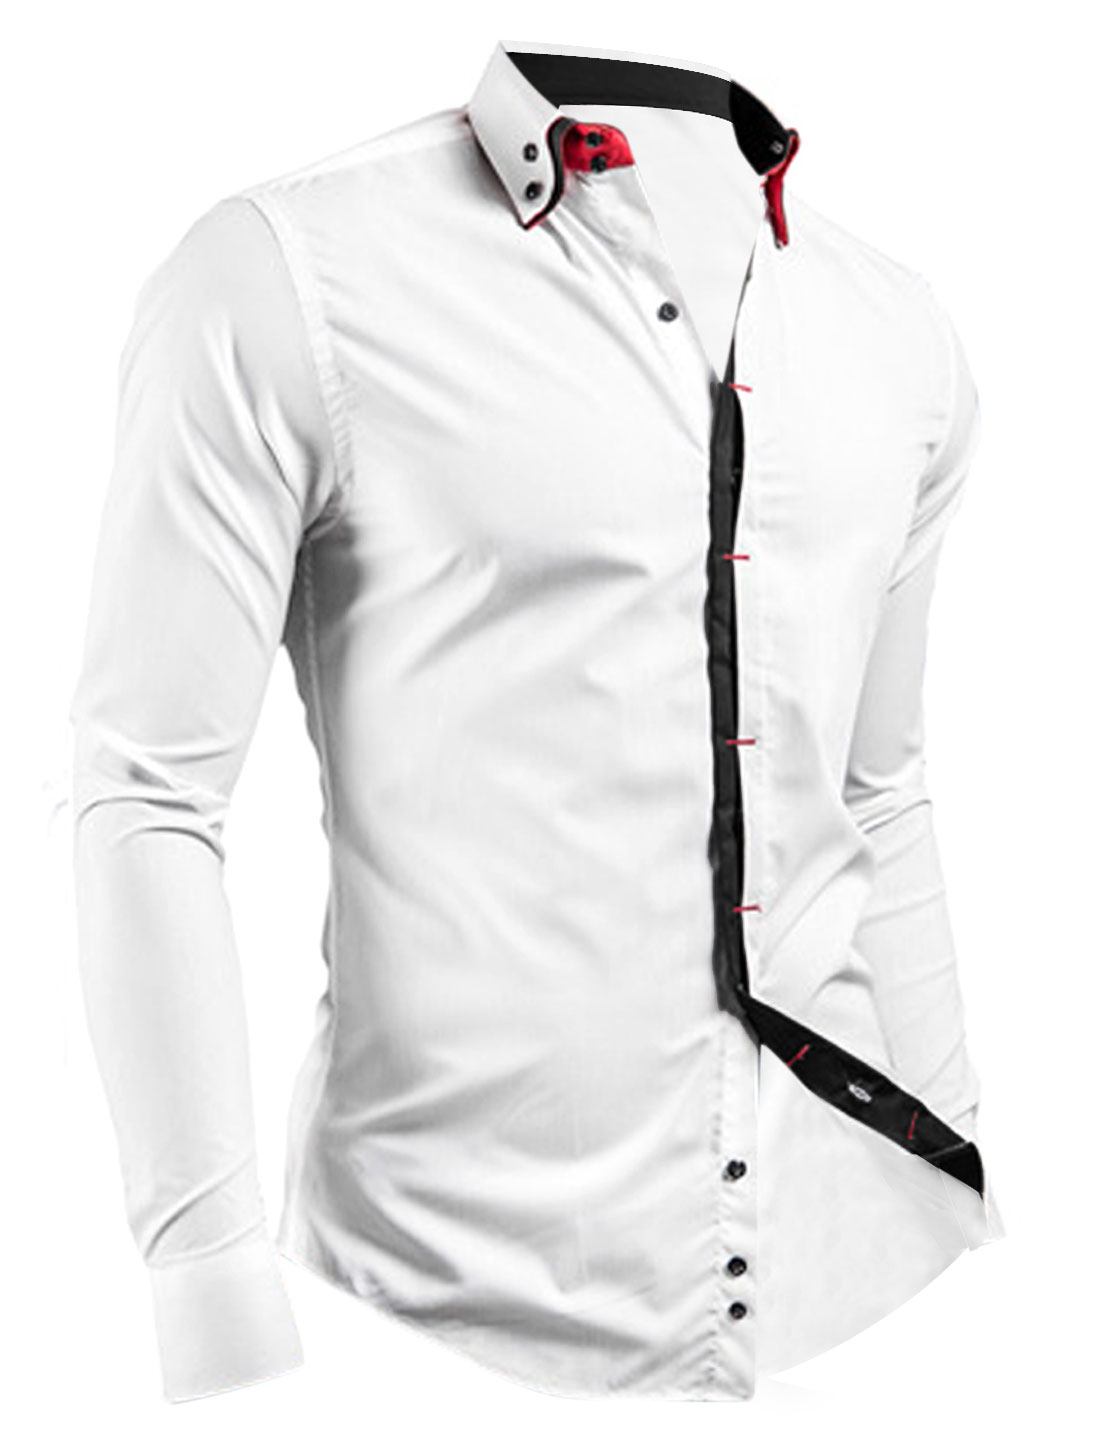 Men Point Collar Hidden Placket Casual Button Down Shirt White M